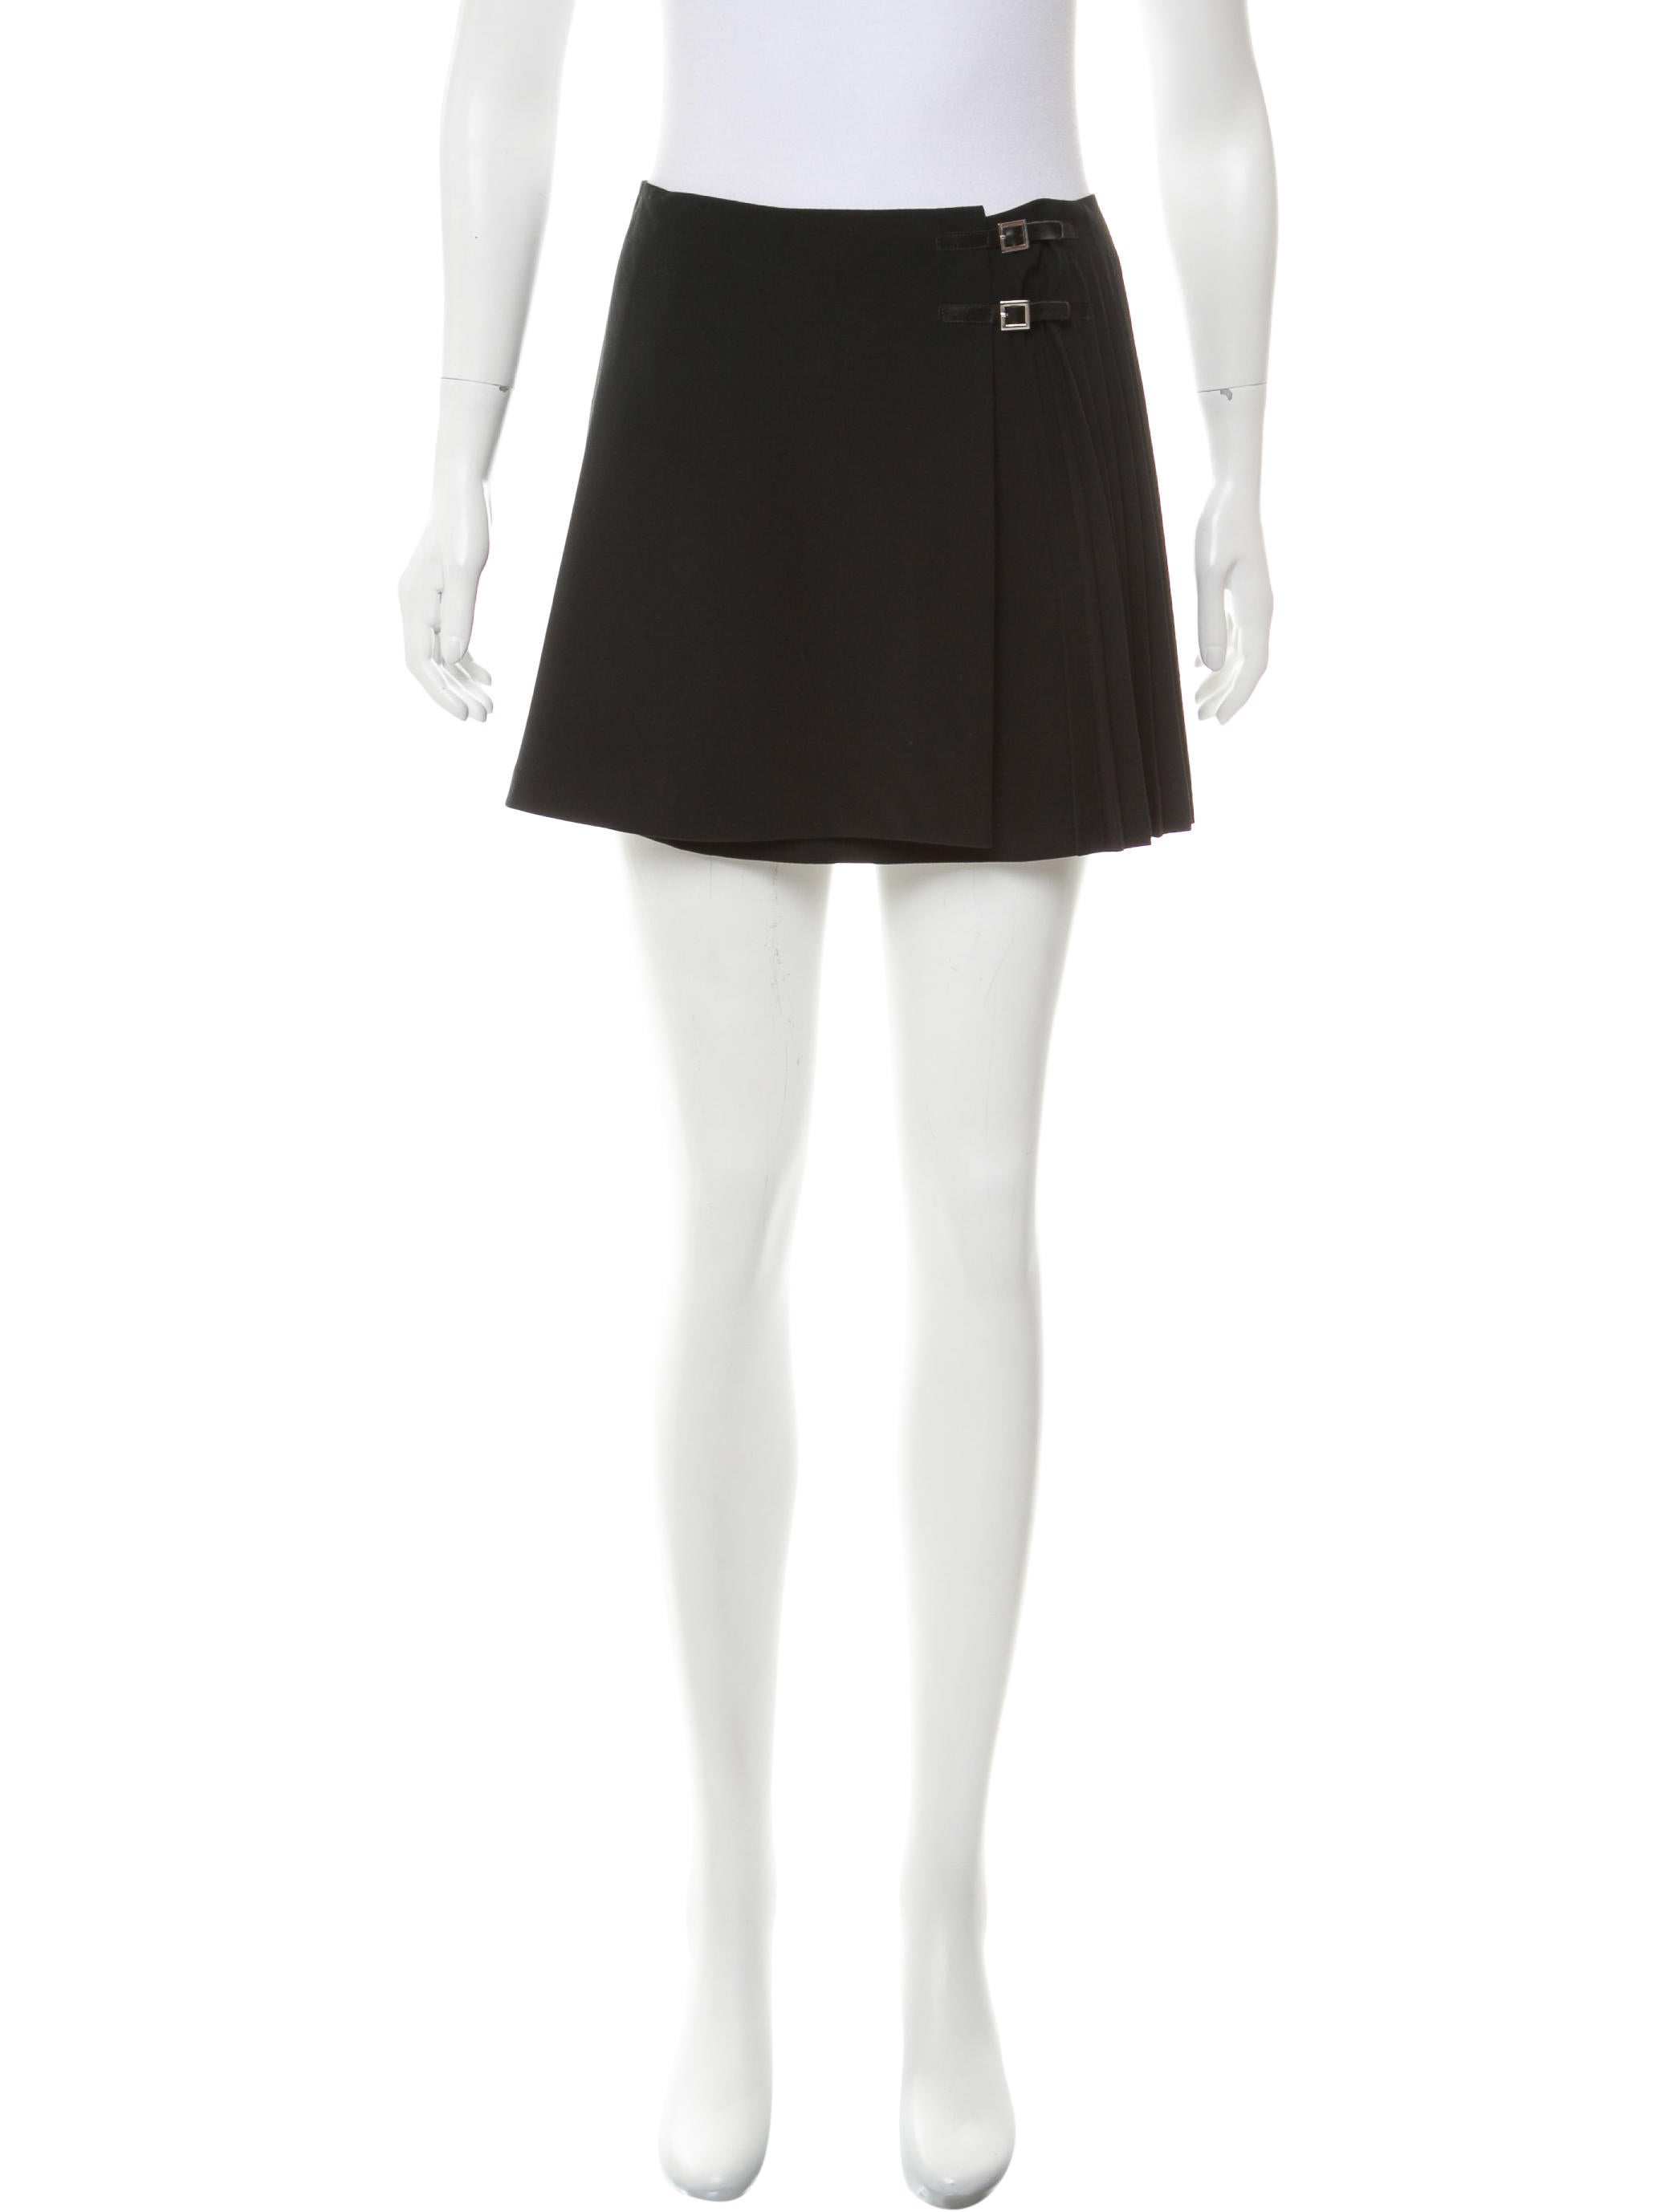 Trina Turk Zip-Accented Mini Skirt Outlet Shop Offer Hf61sR